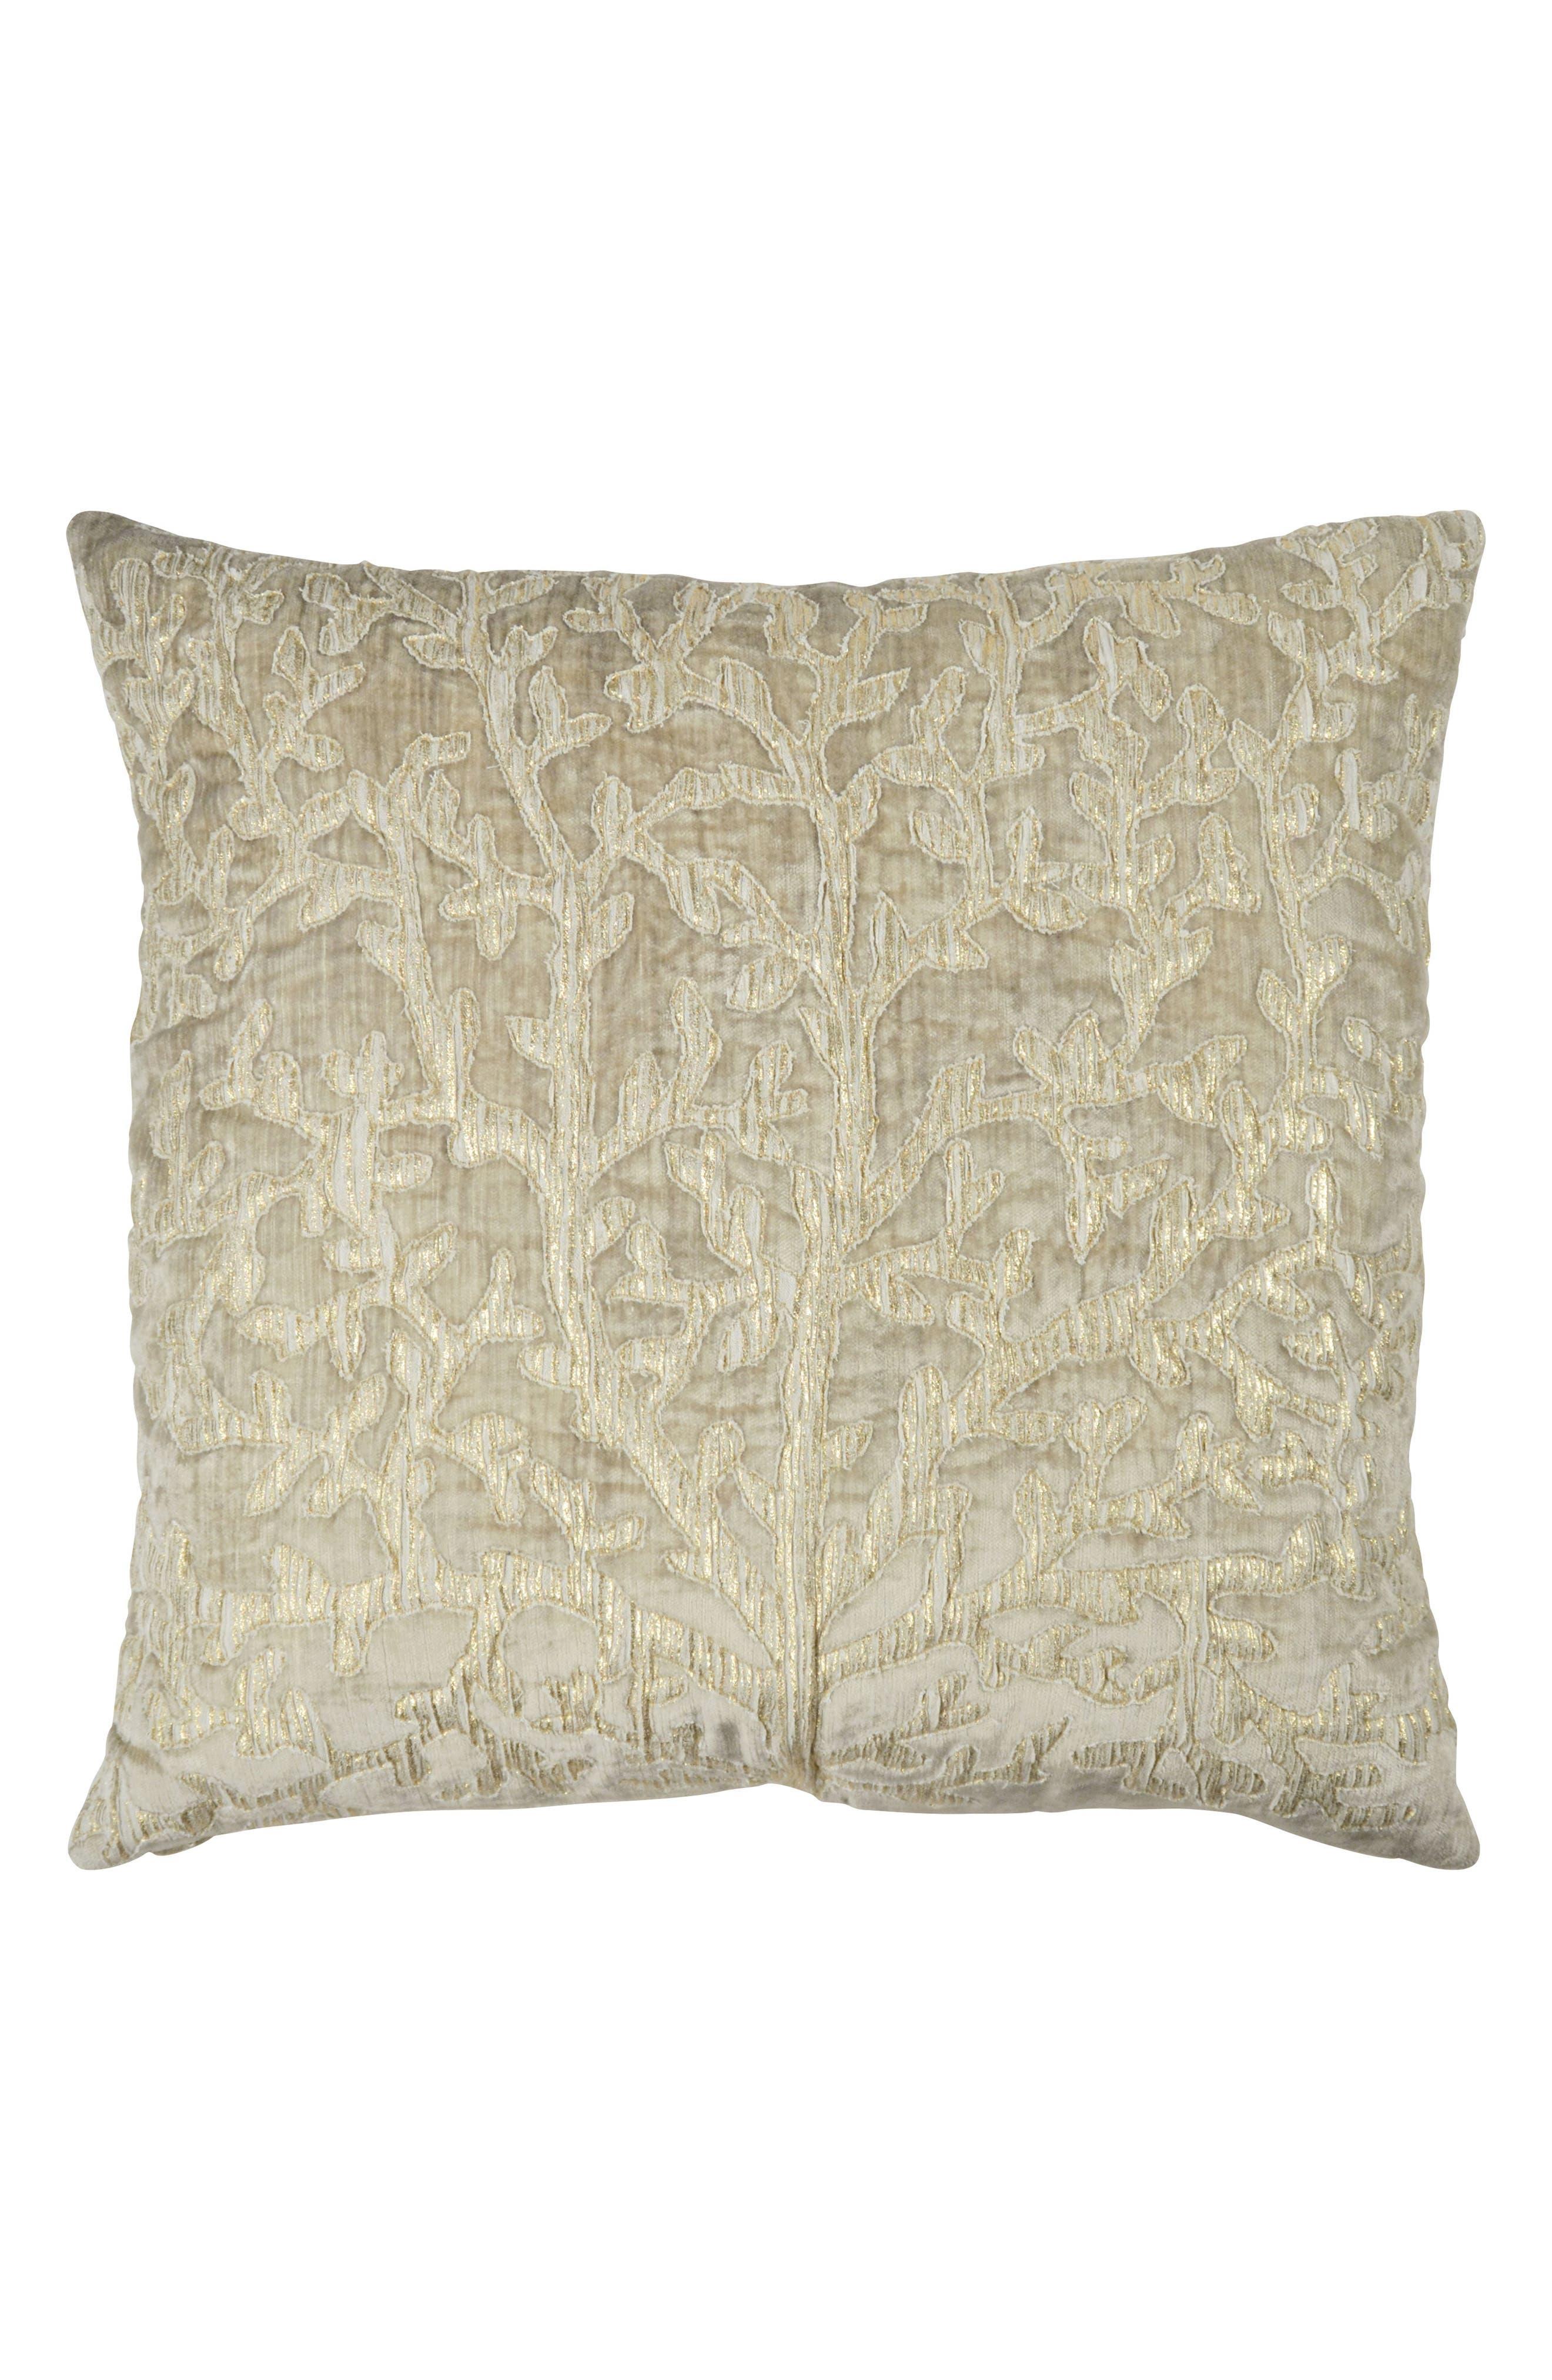 Michael Aram Tree of Life Appliqué Accent Pillow